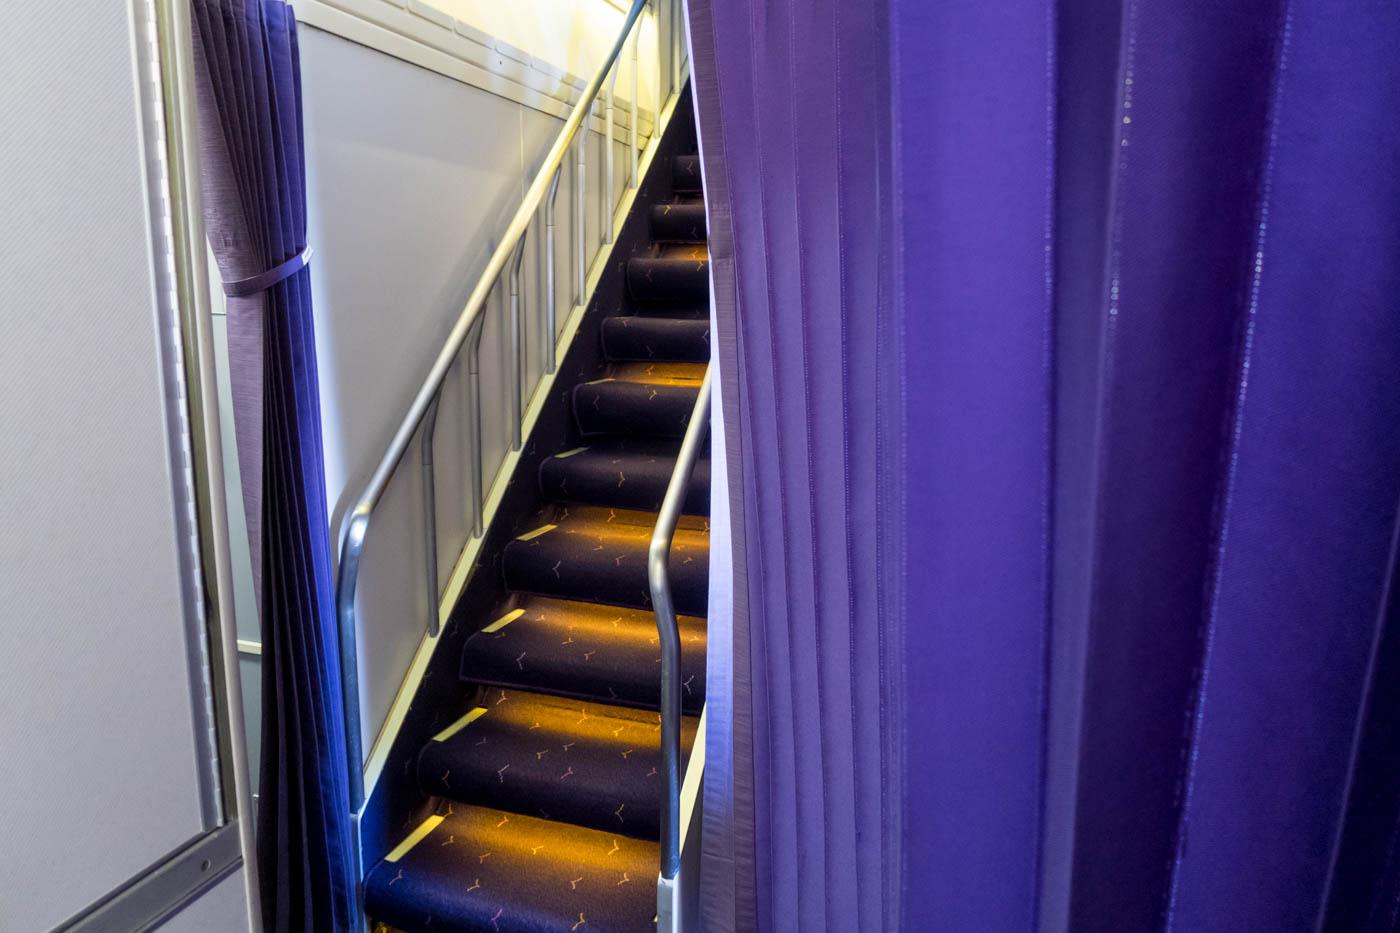 Thai Airways Boeing 747-400 Staircase